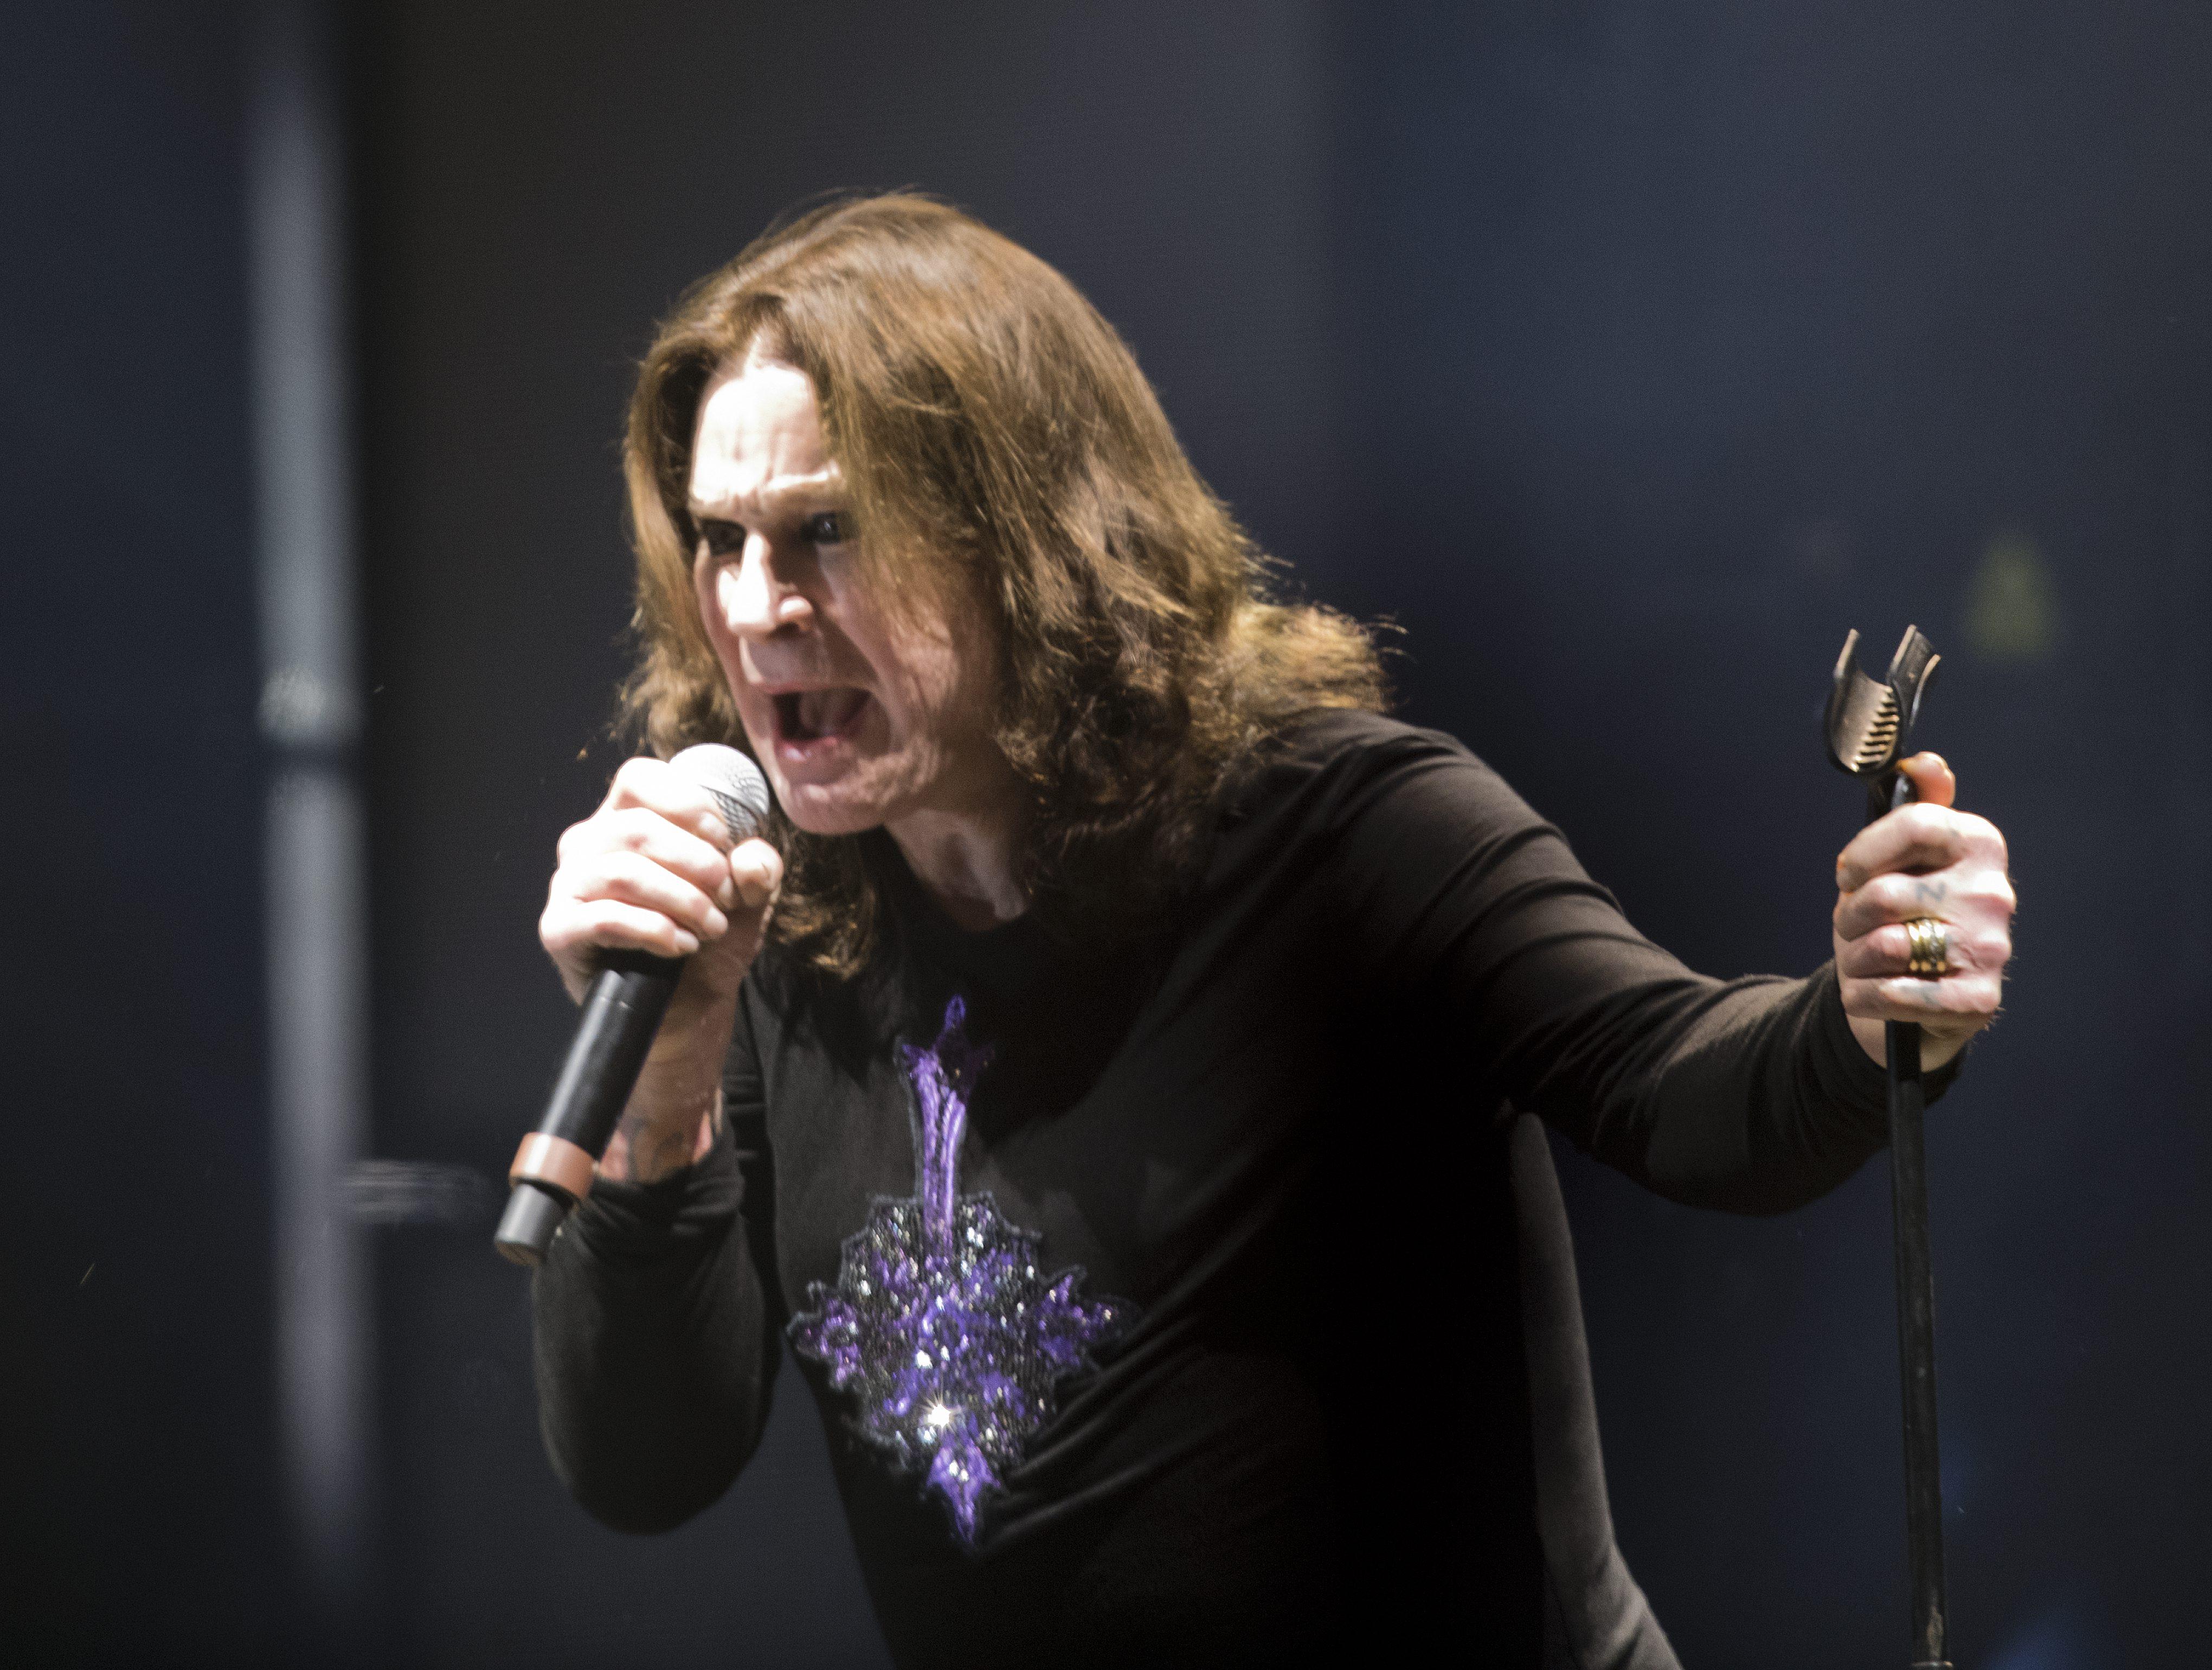 AEG Says Ozzy Osbournes Lawsuit Is a Live Nation Sham